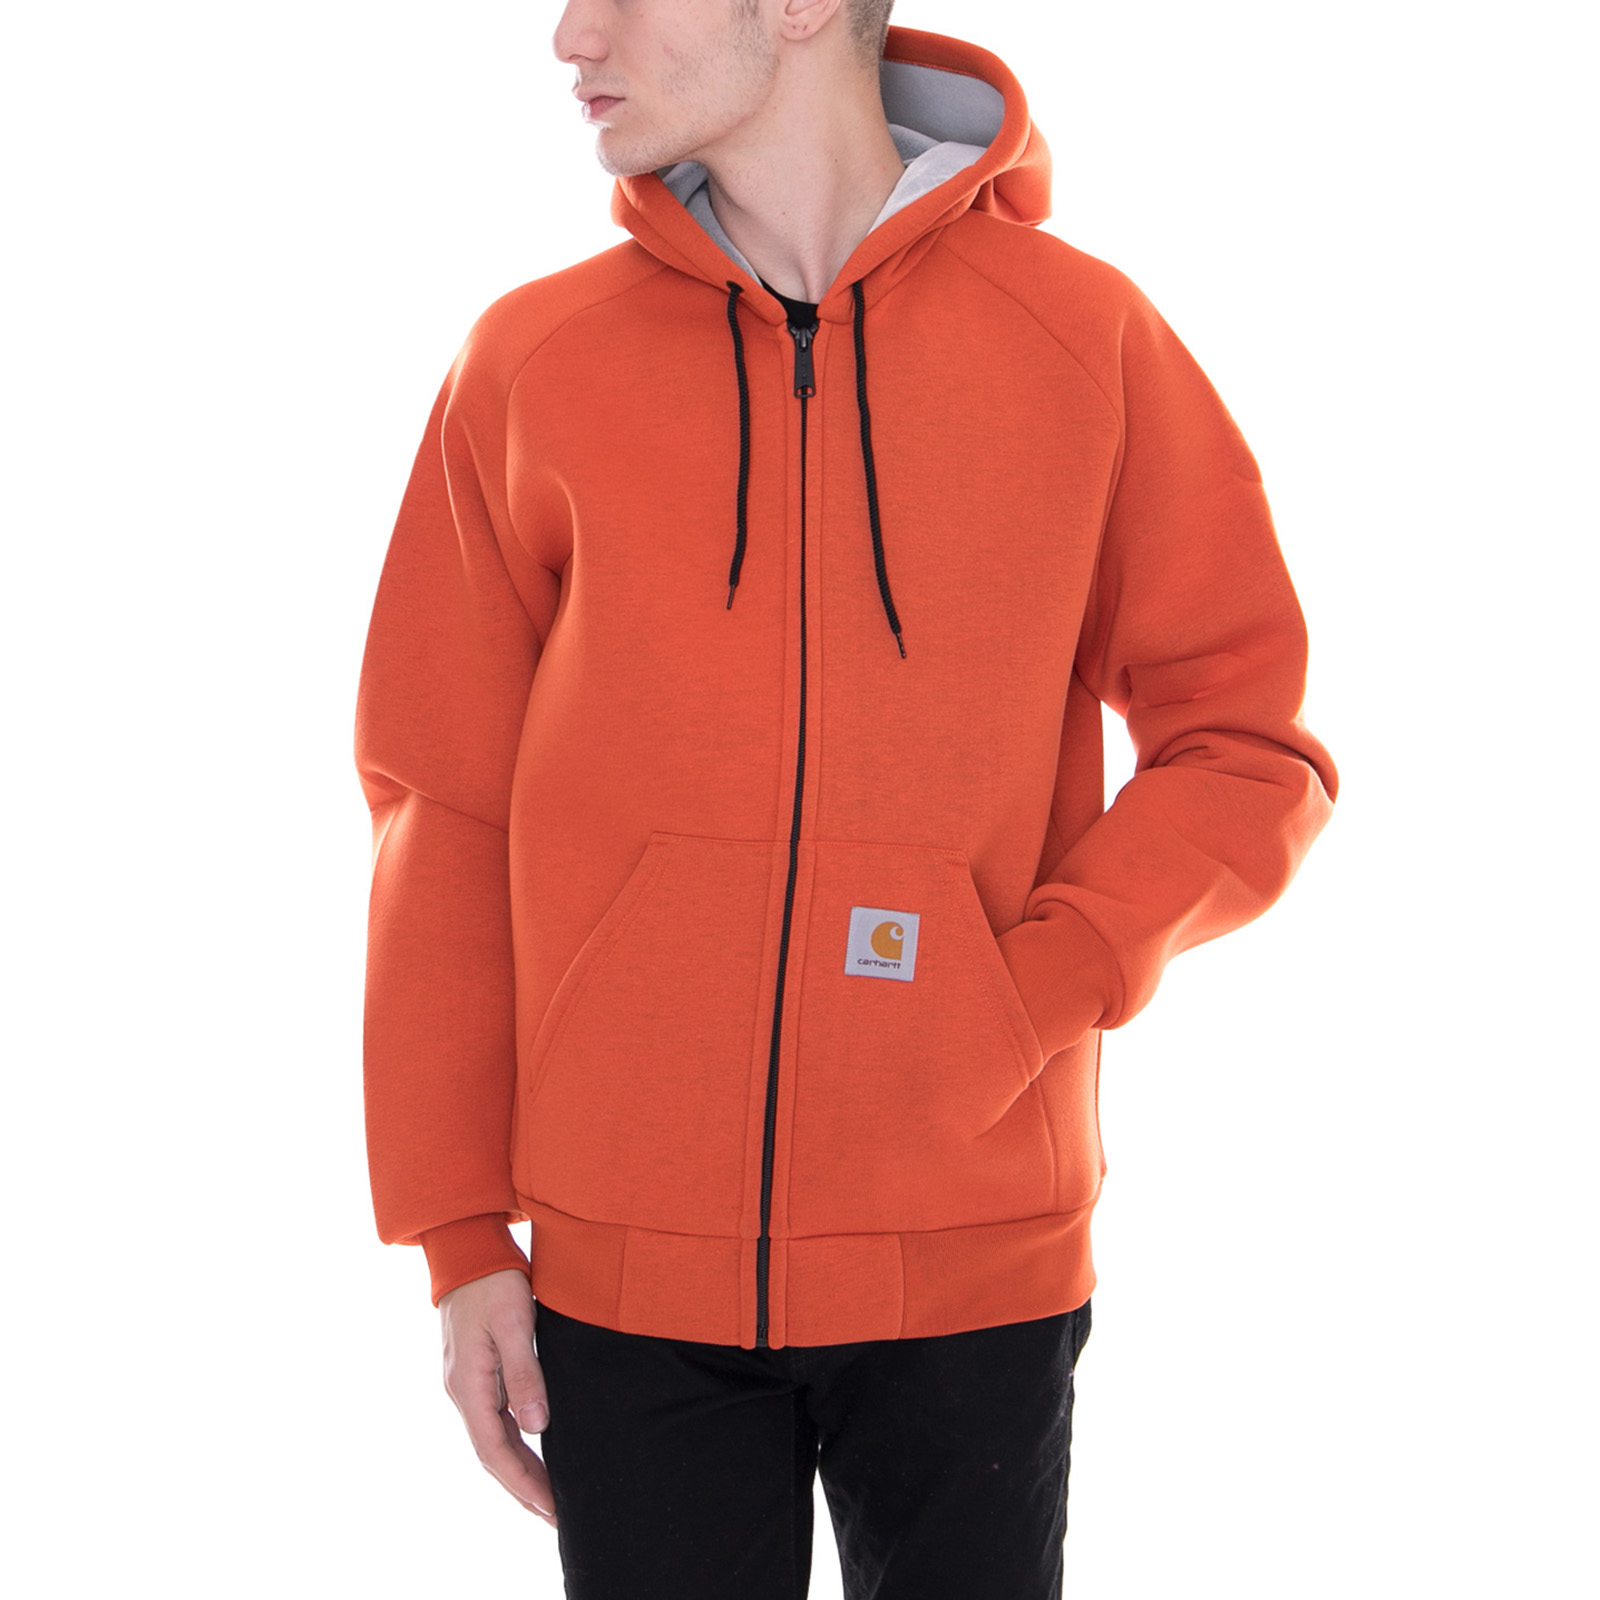 Persimmon lux Giacche Orange Arancione Jacket Hooded Carhartt Car apgvXqw6